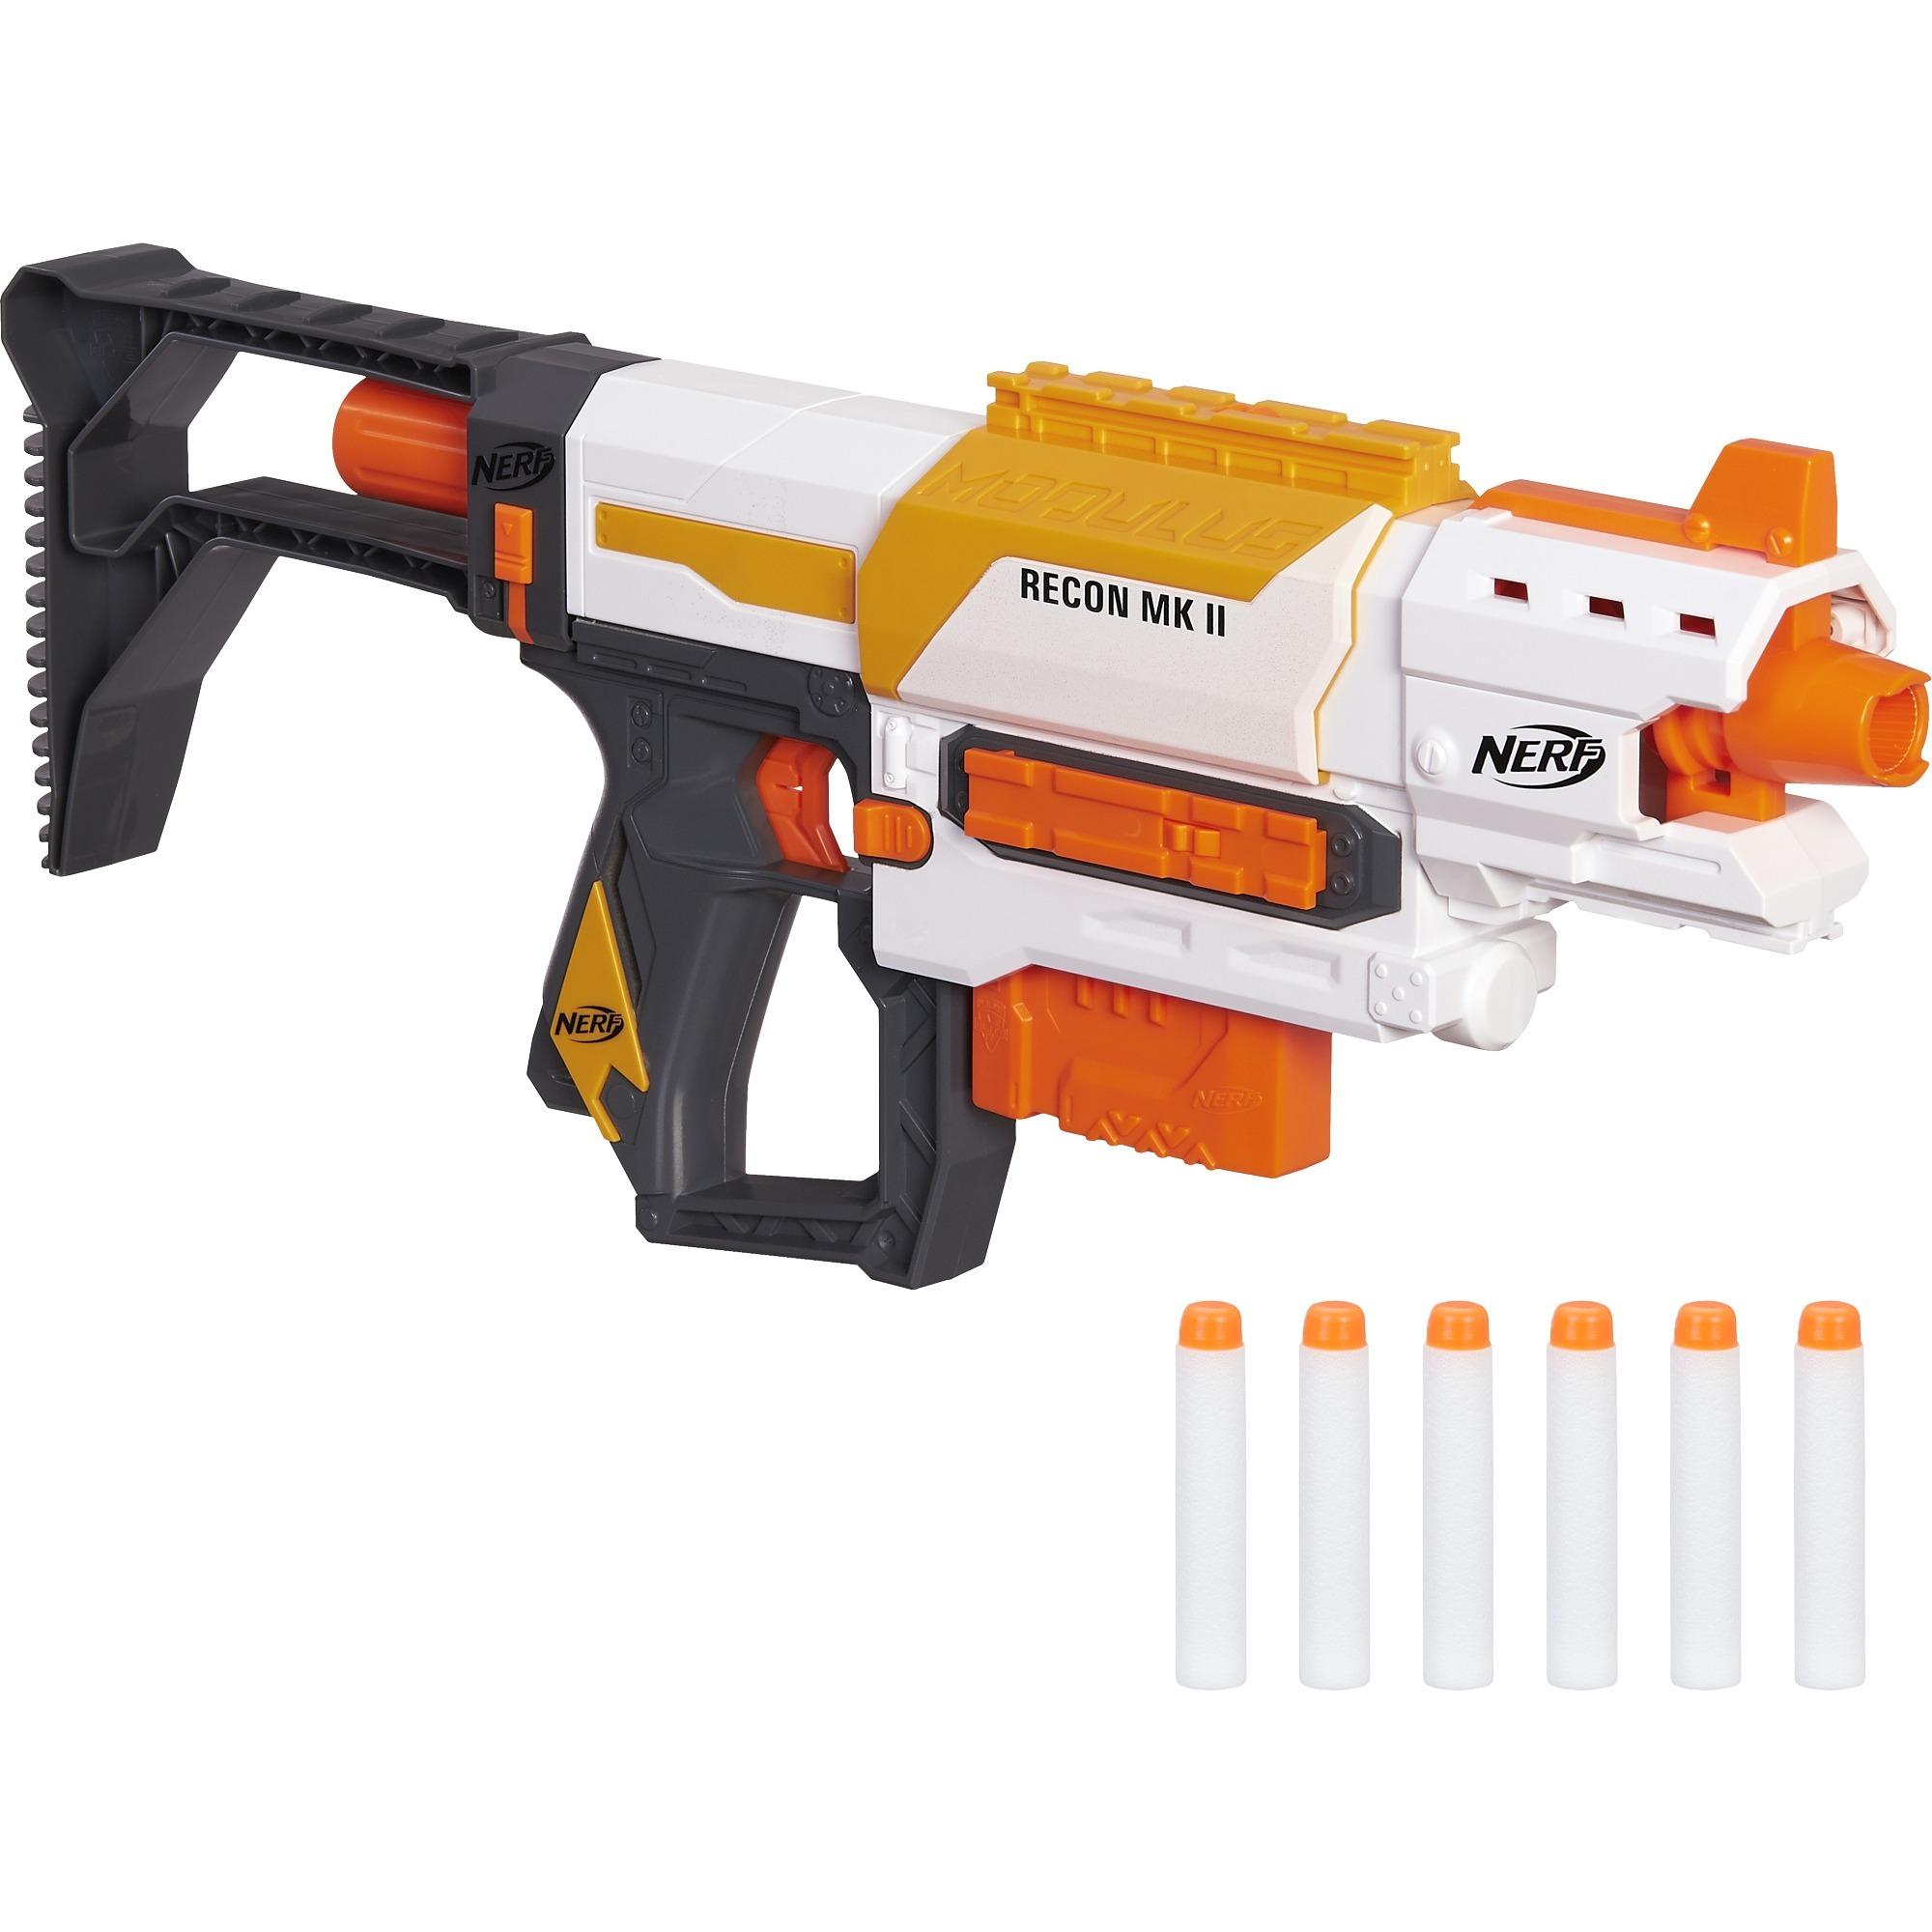 nerf-n-strike-elite-modulus-recon-mkii-blaster-nerf-gun